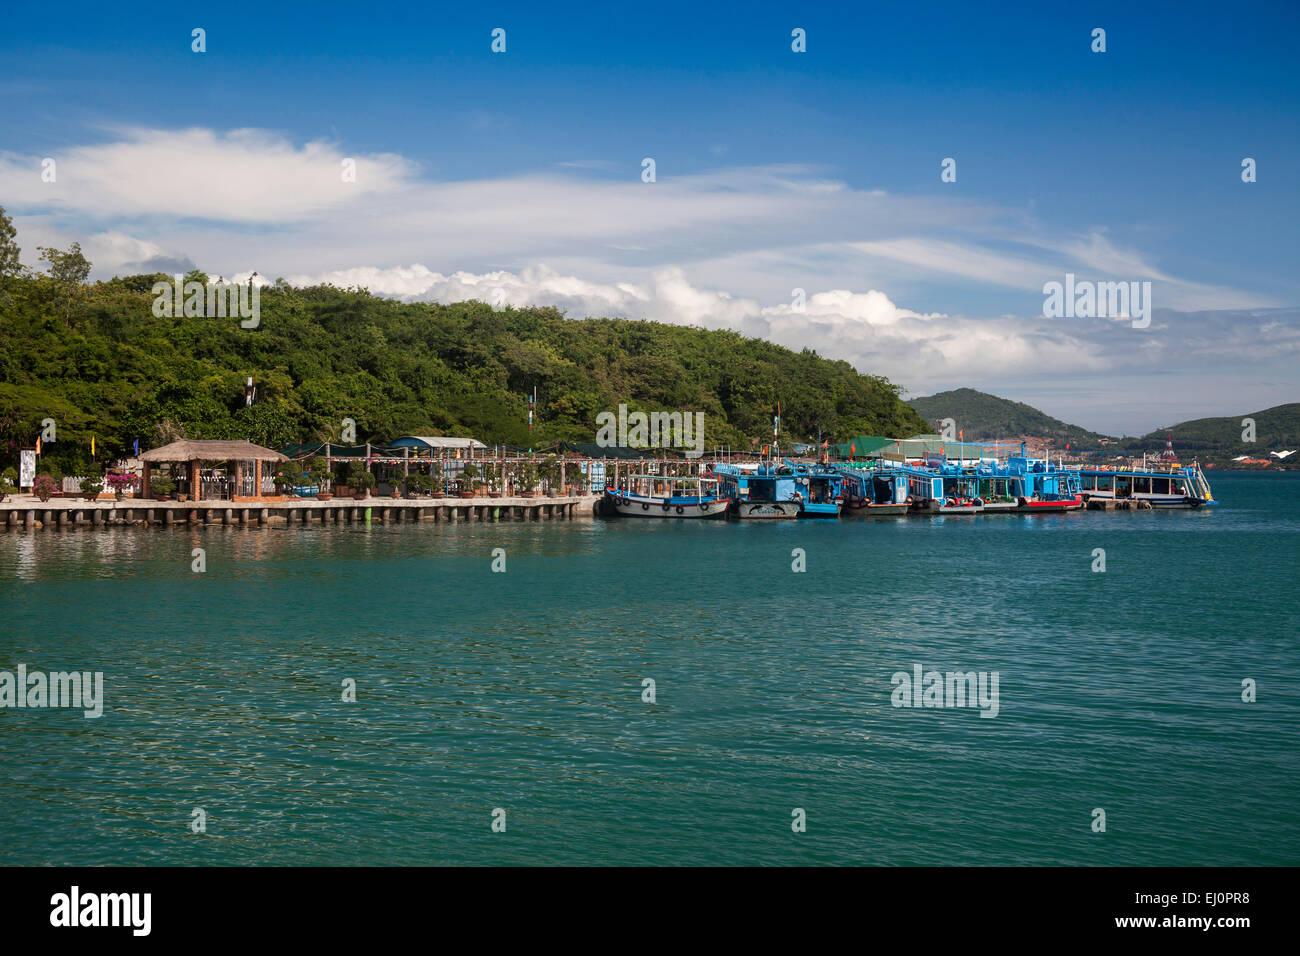 Bay, Vinpearl, island, South China Sea, sea, Asian, Asia, outside, mountains, mountainous, landscape, island, scenery, - Stock Image